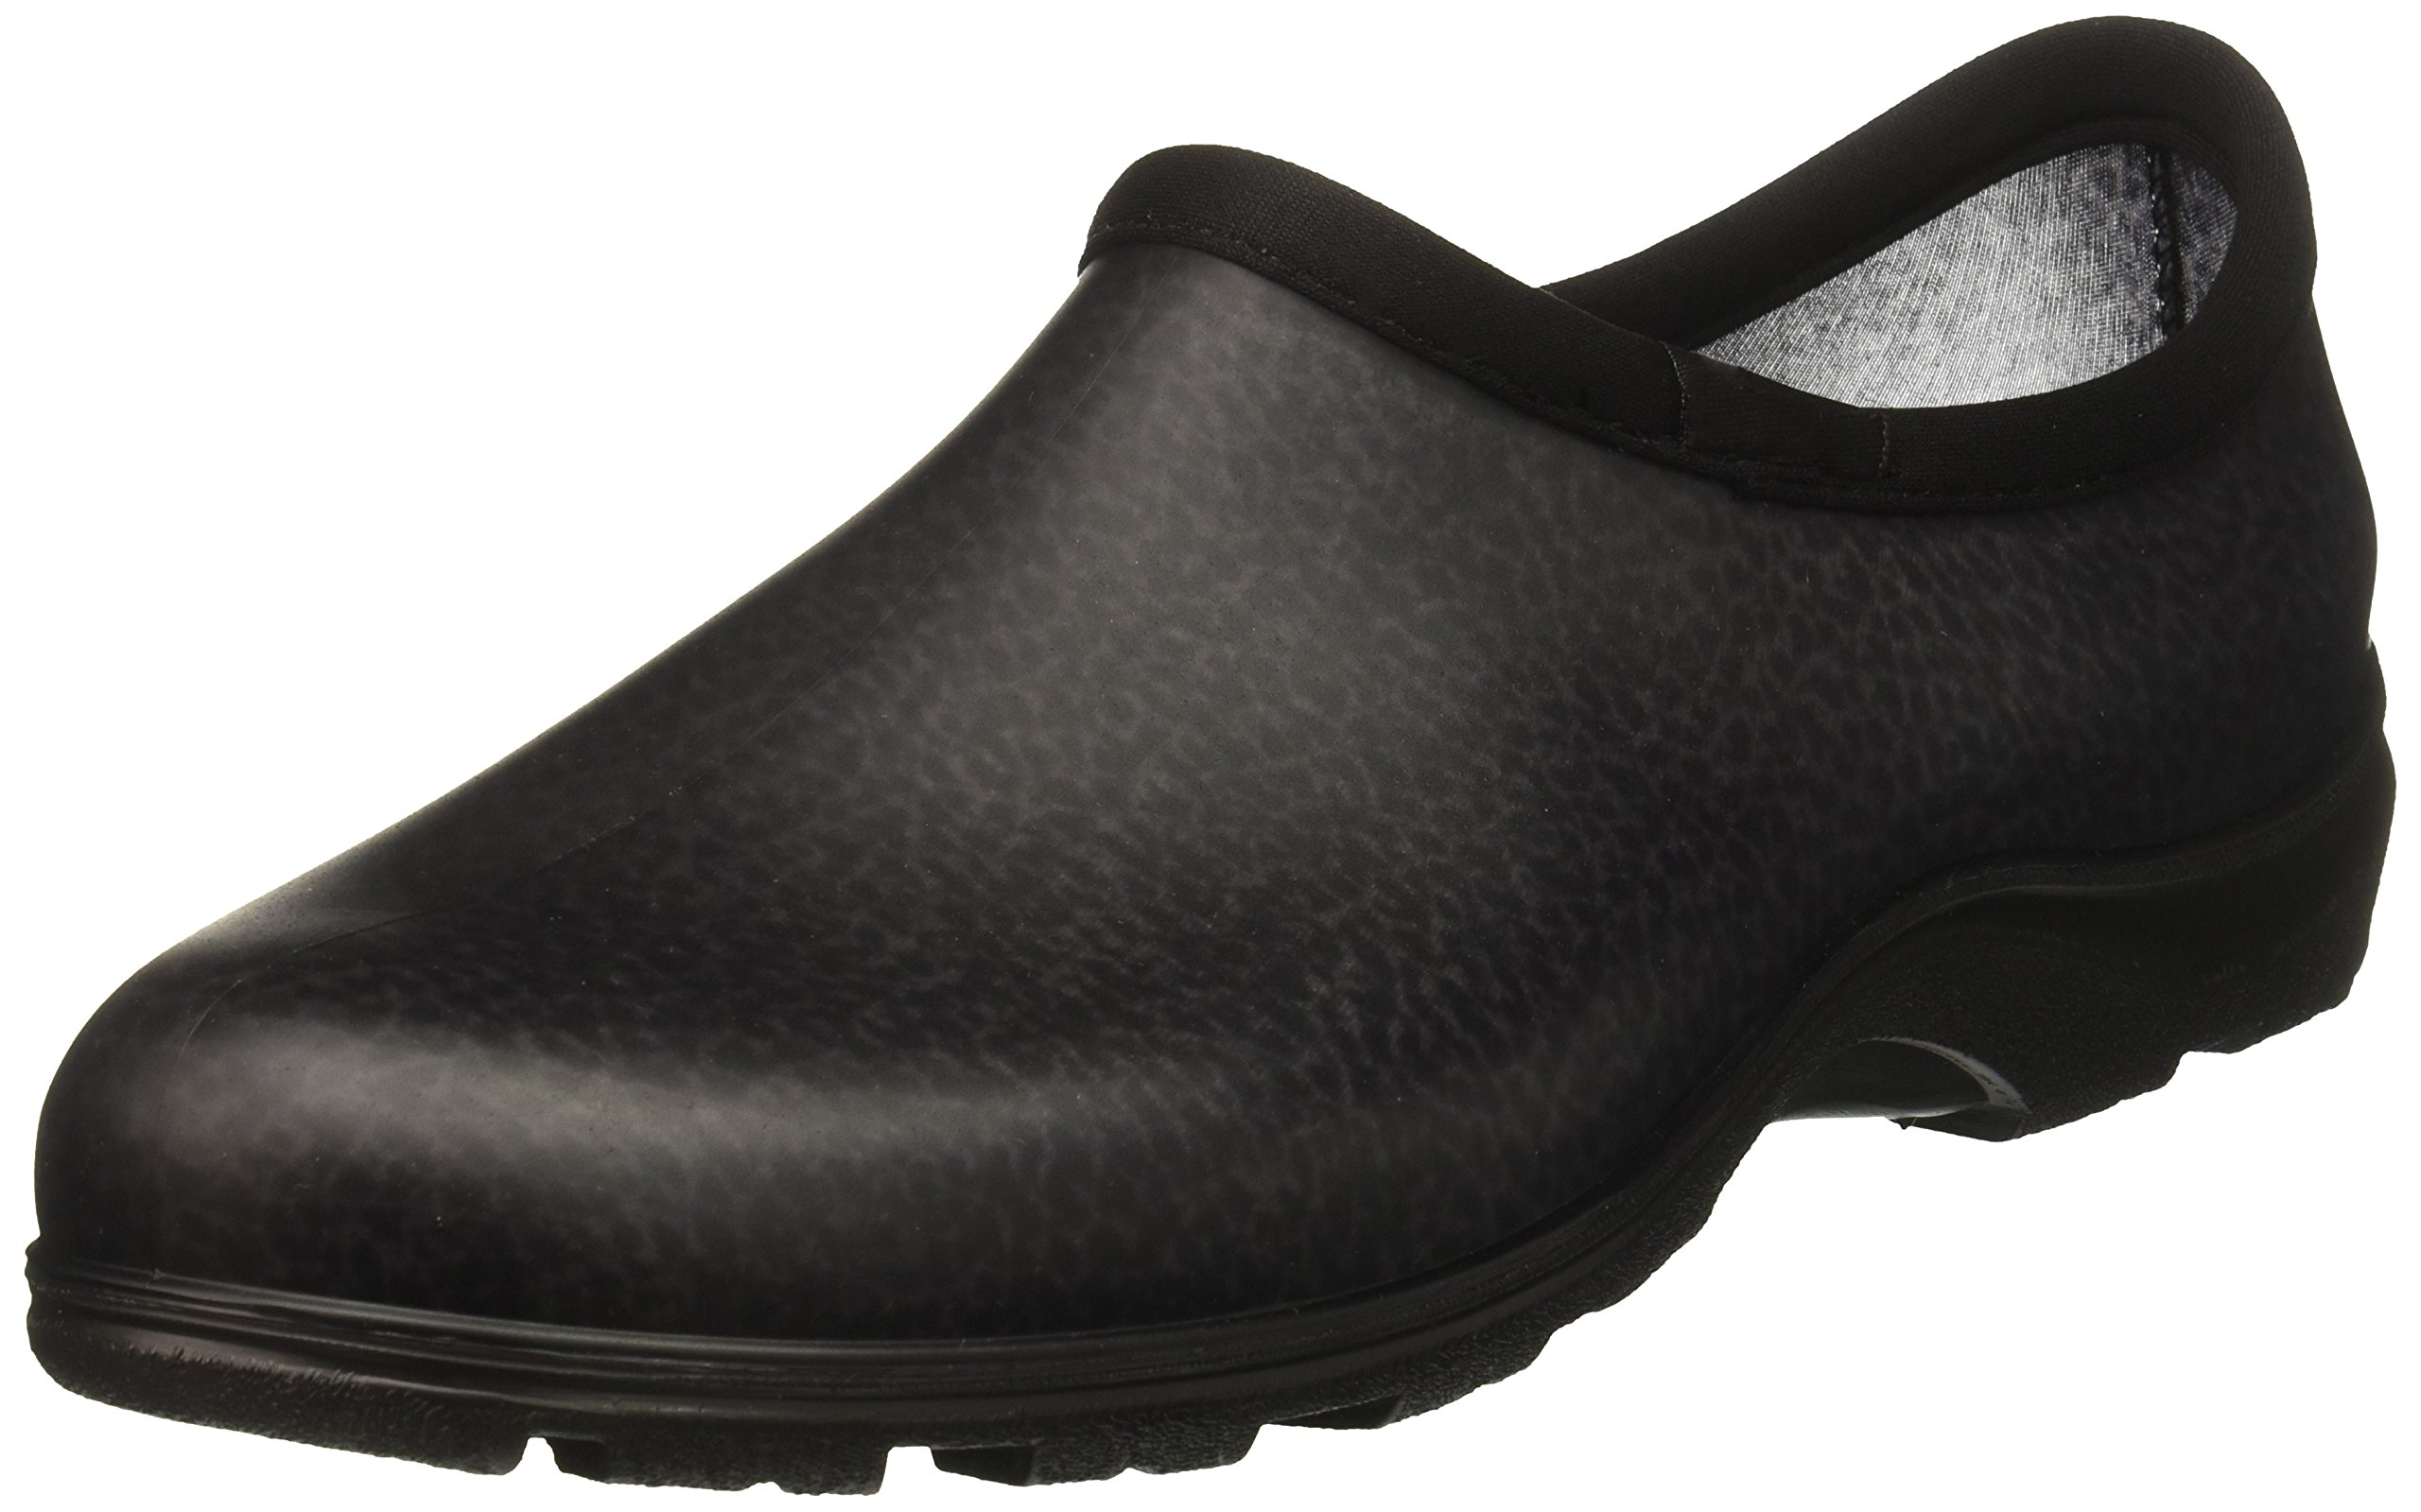 Sloggers Men's Waterproof Shoe with Comfort Insole, Black, Size 11, Style 5301BK11